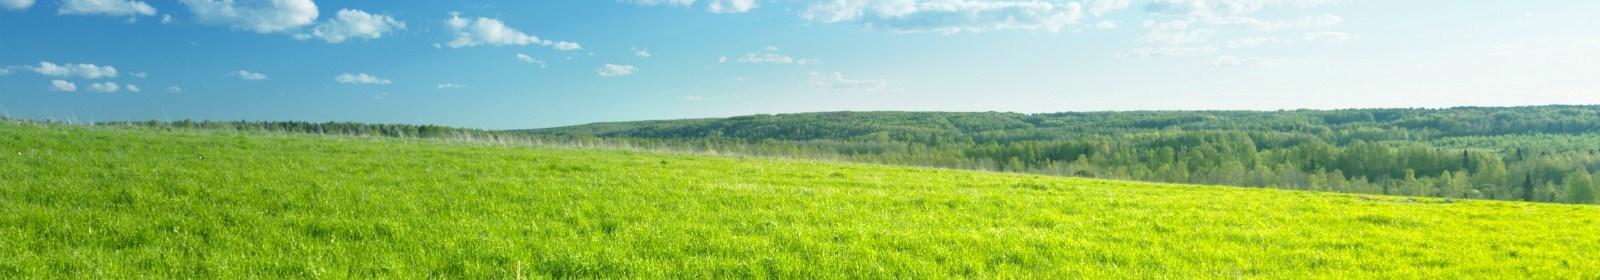 Land expropriation Amendment hearings